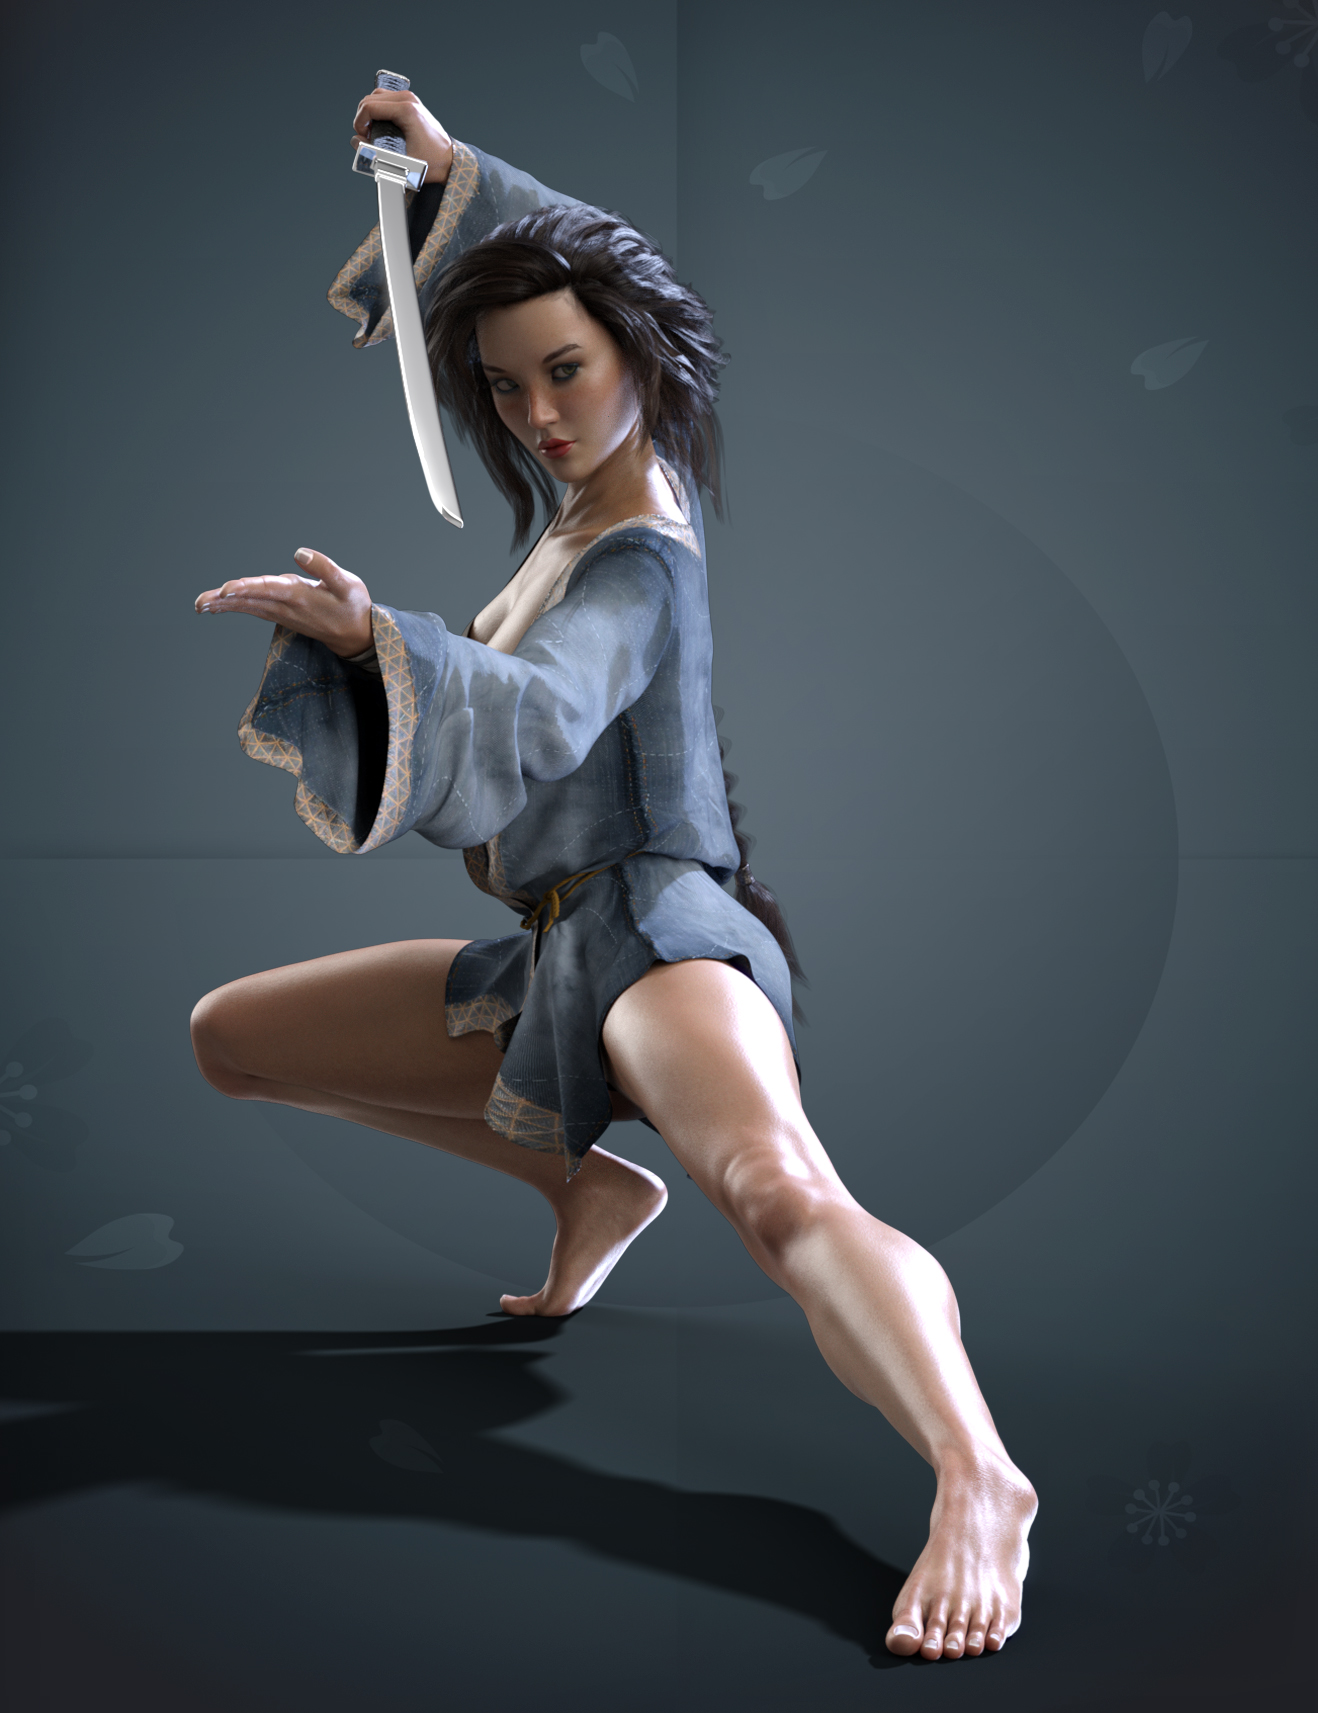 X-Fashion Warrior Kimono for Genesis 8 Female(s) by: xtrart-3d, 3D Models by Daz 3D